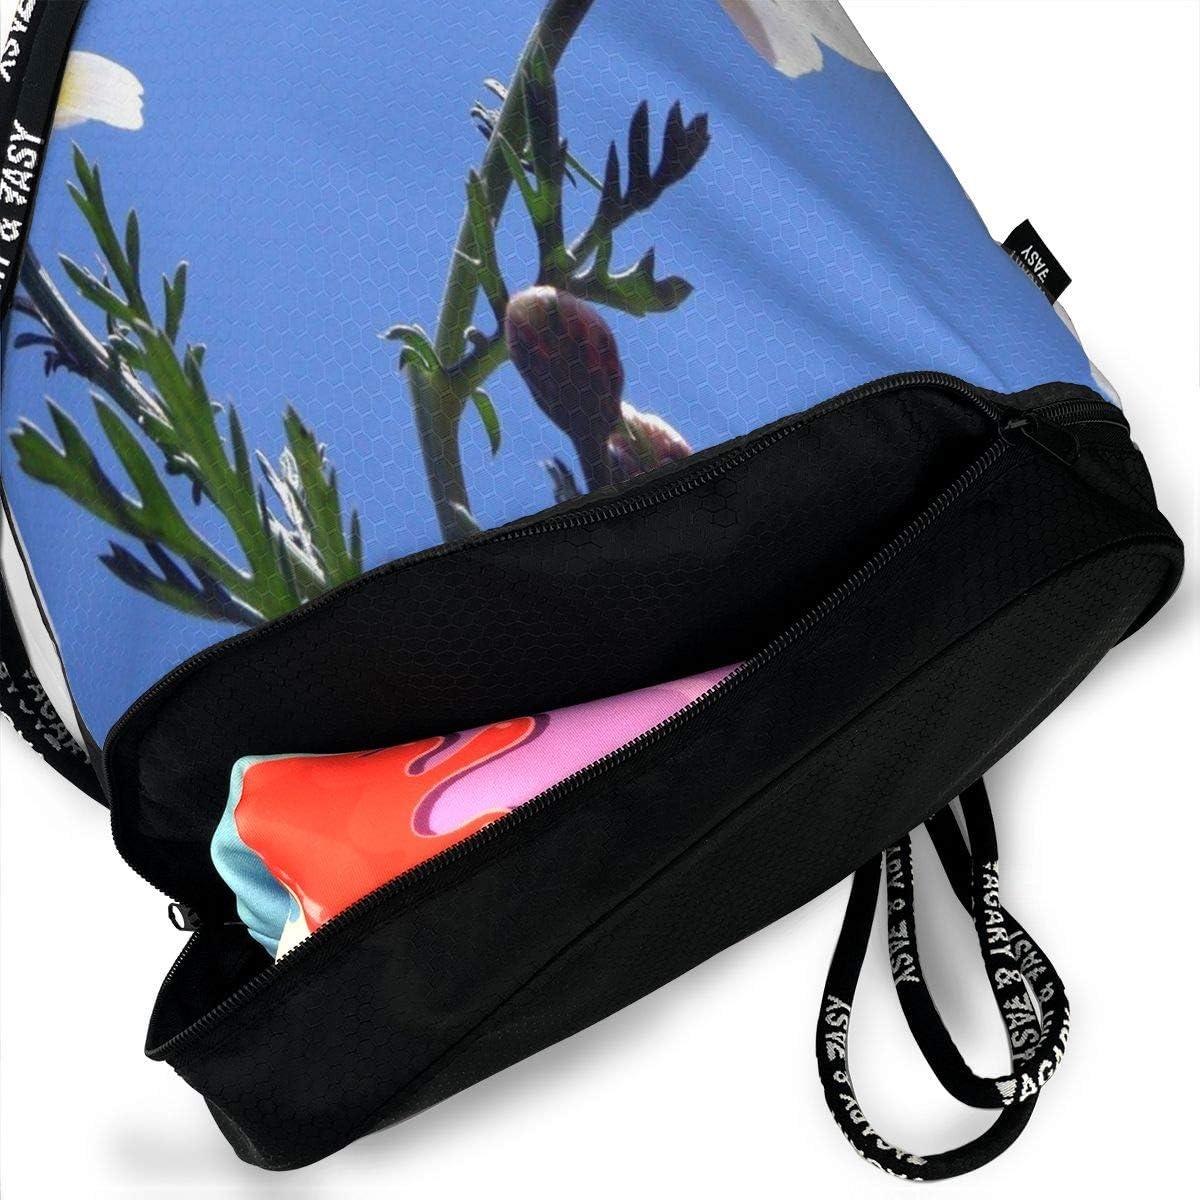 Drawstring Backpack Chrysanthemum Bags Knapsack For Hiking